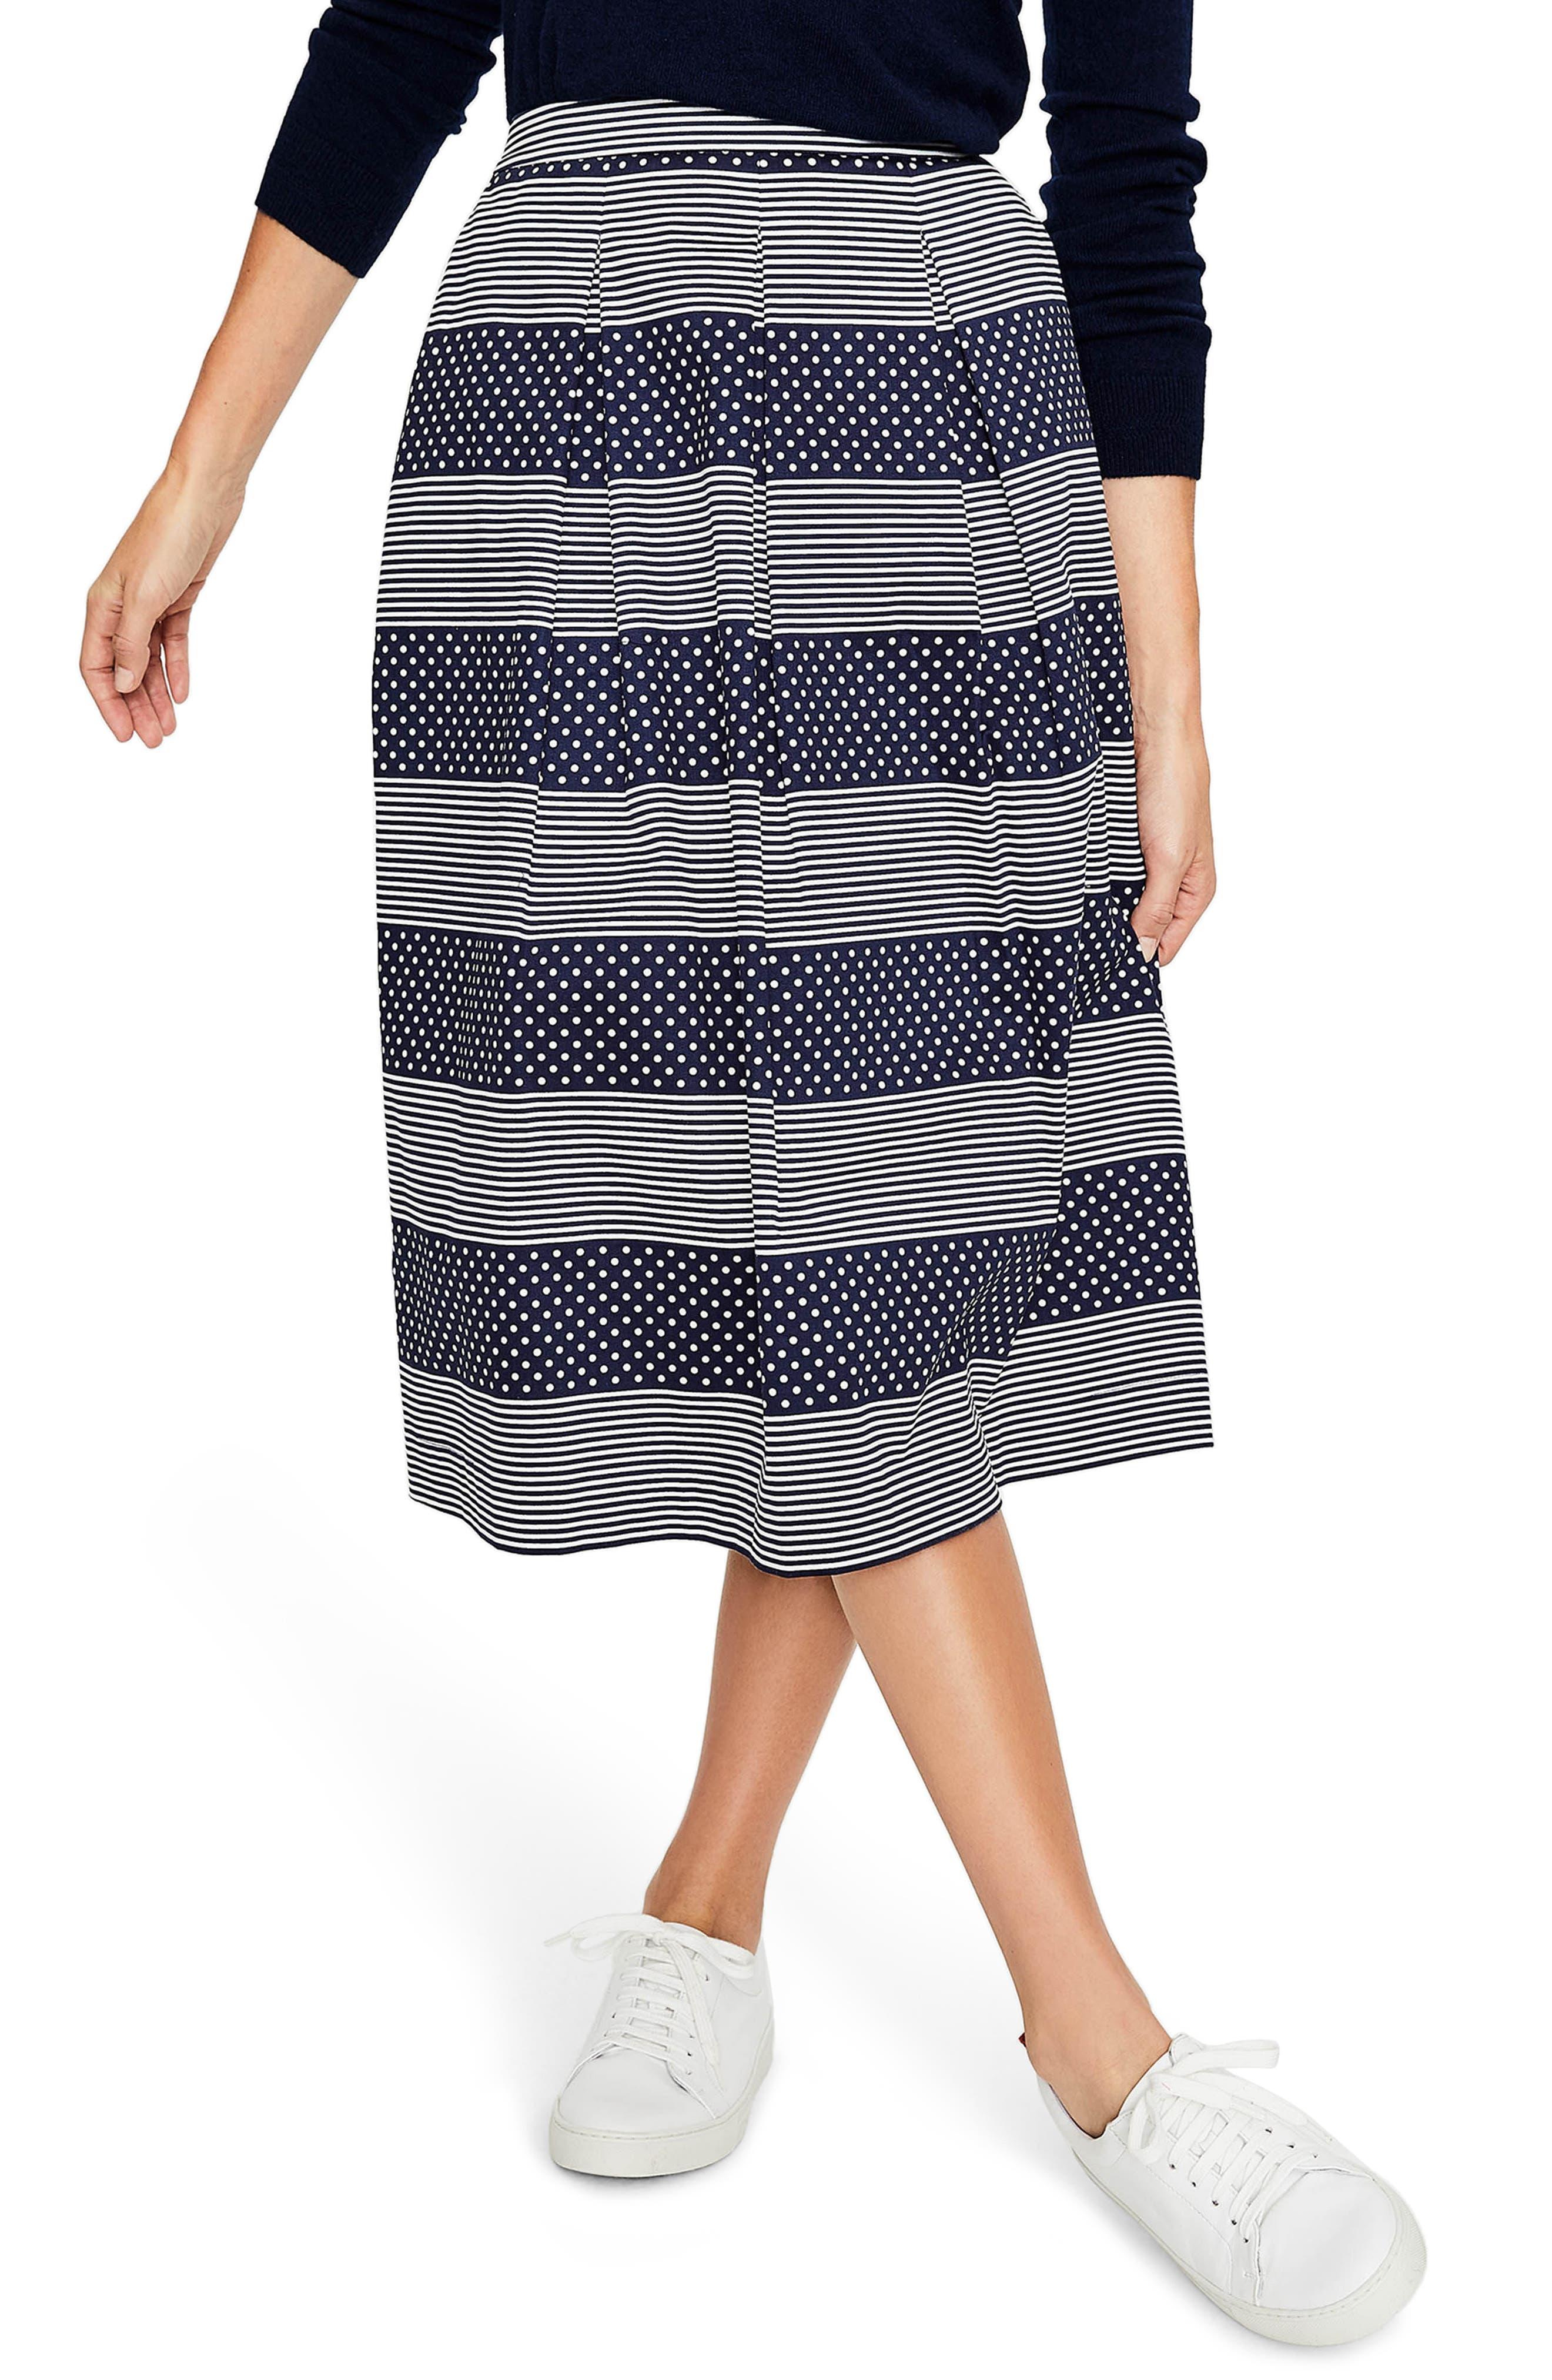 Lola Floral Flared Skirt,                             Main thumbnail 1, color,                             Navy/ Spot Stripe